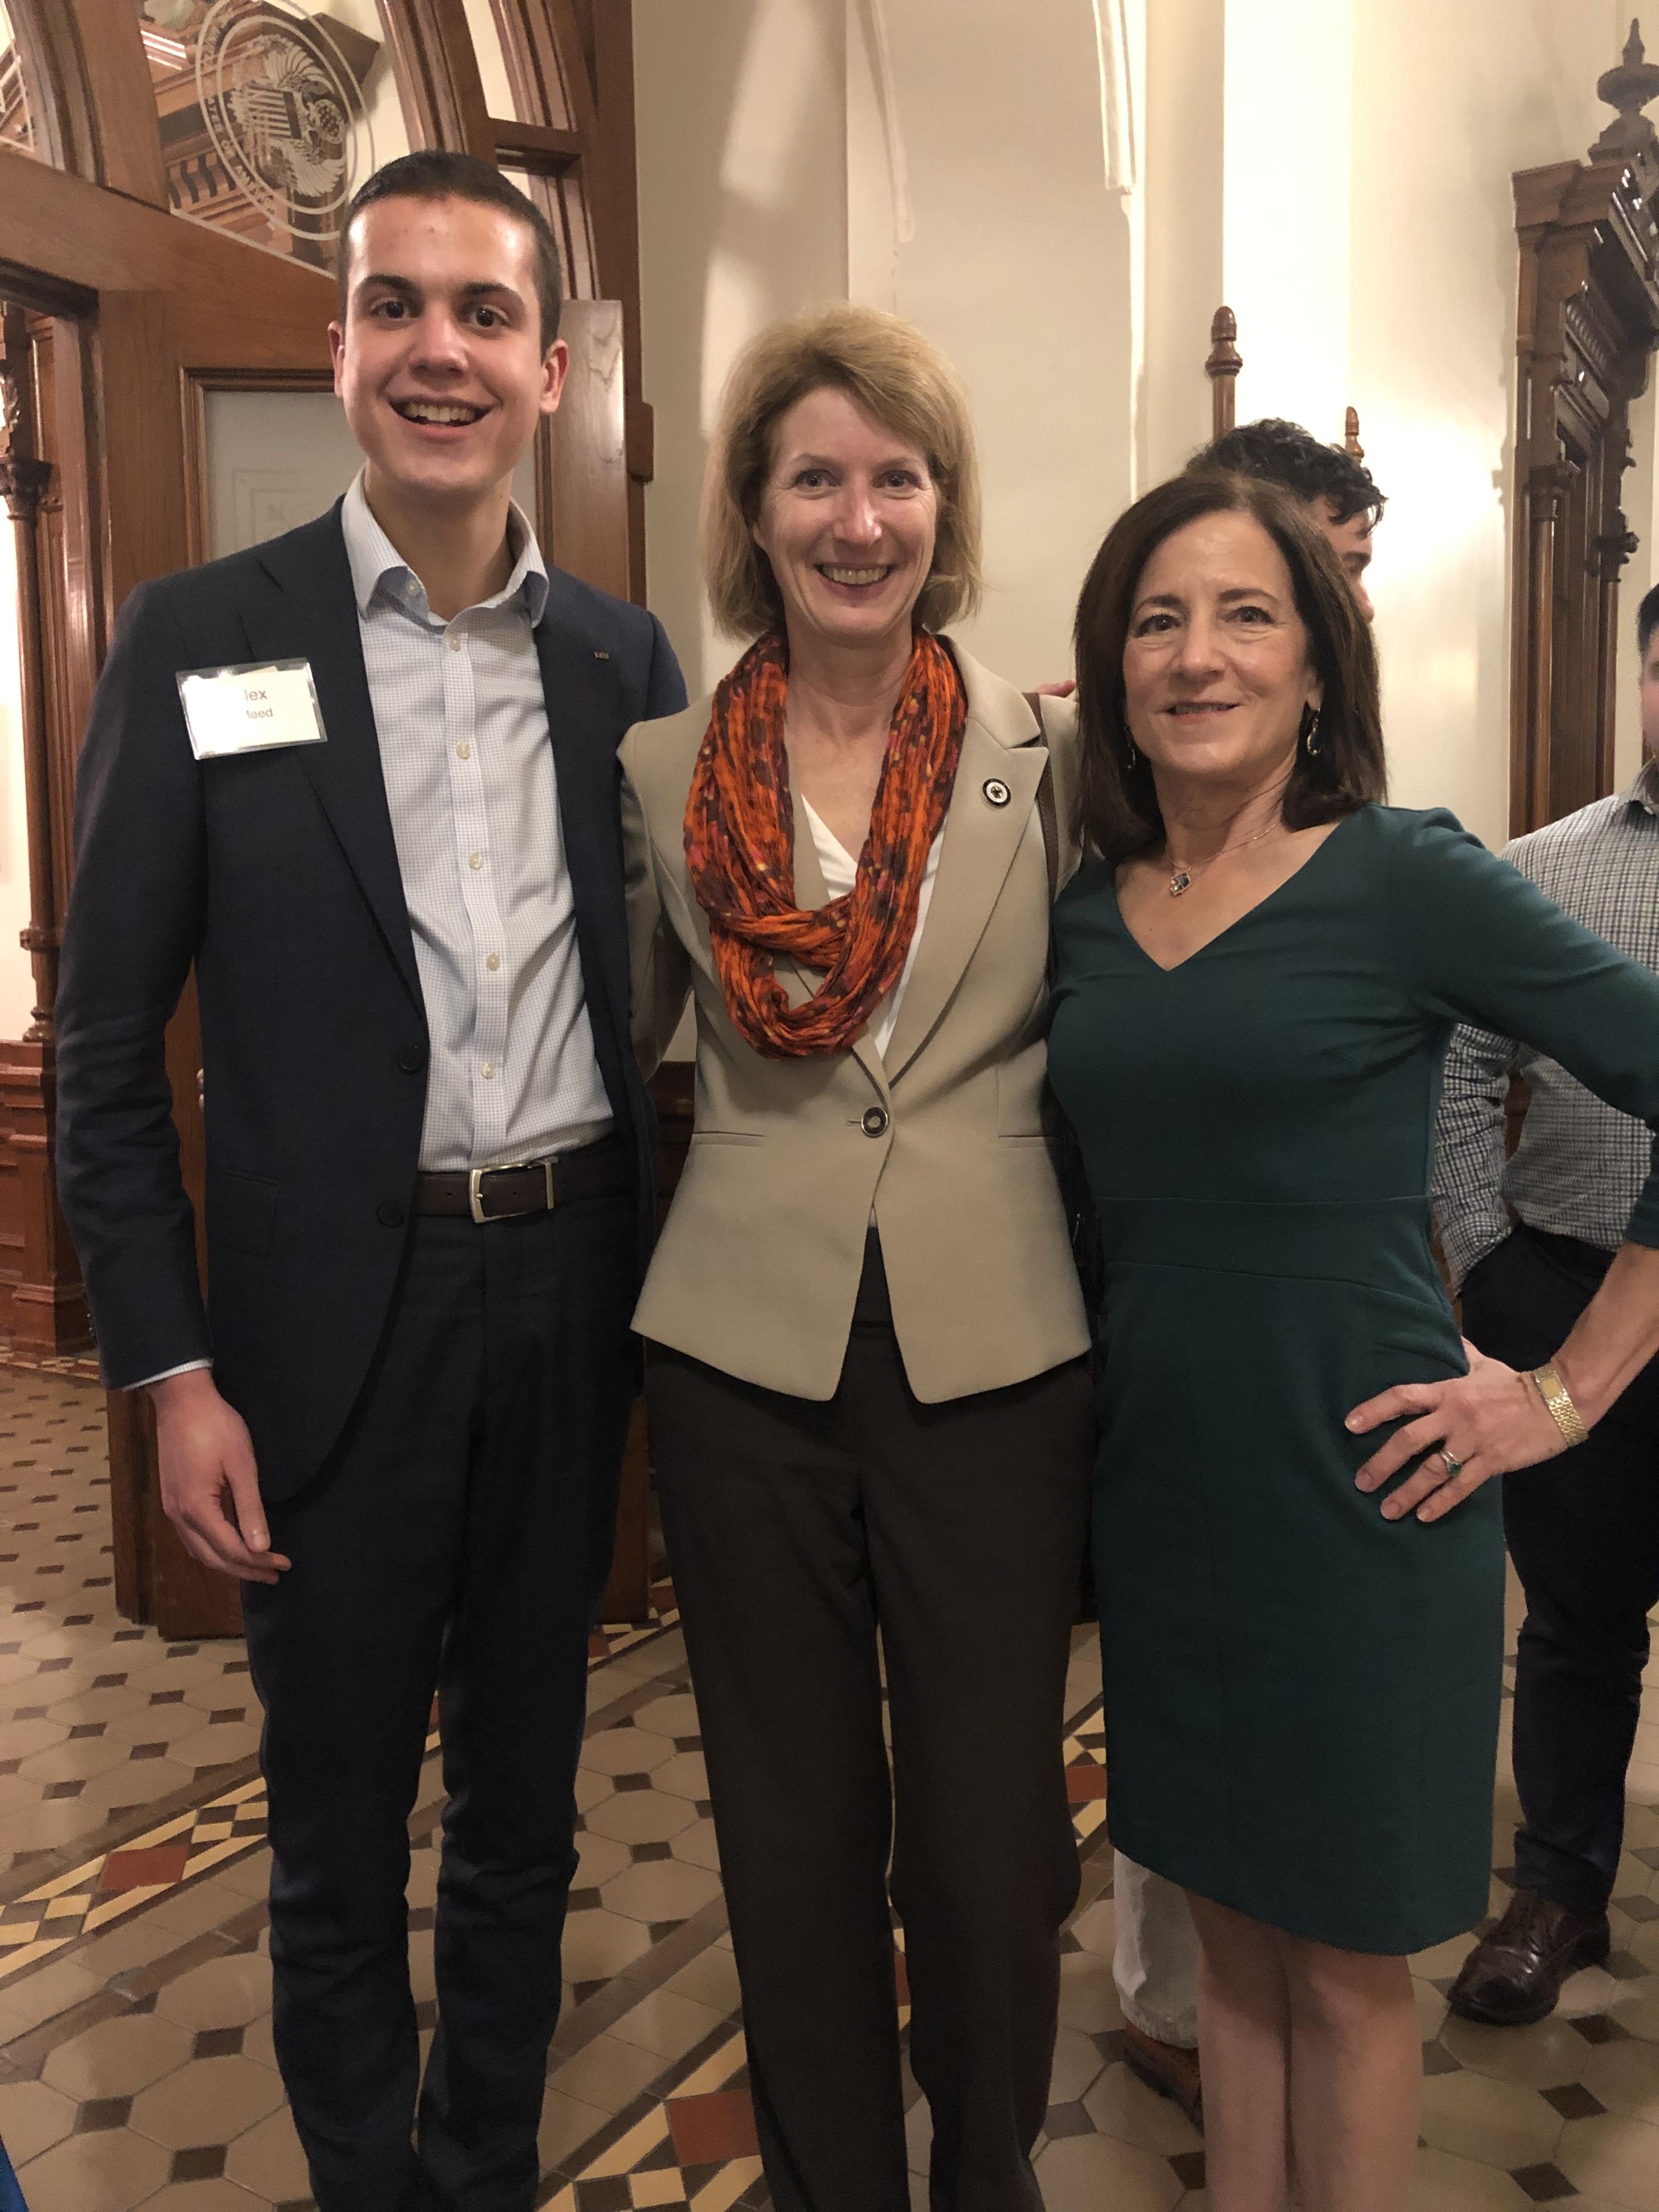 LBJ student Alex Meed with state Rep. Vikki Goodwin (MPAff '91) and LBJ Professor Sherri Greenberg